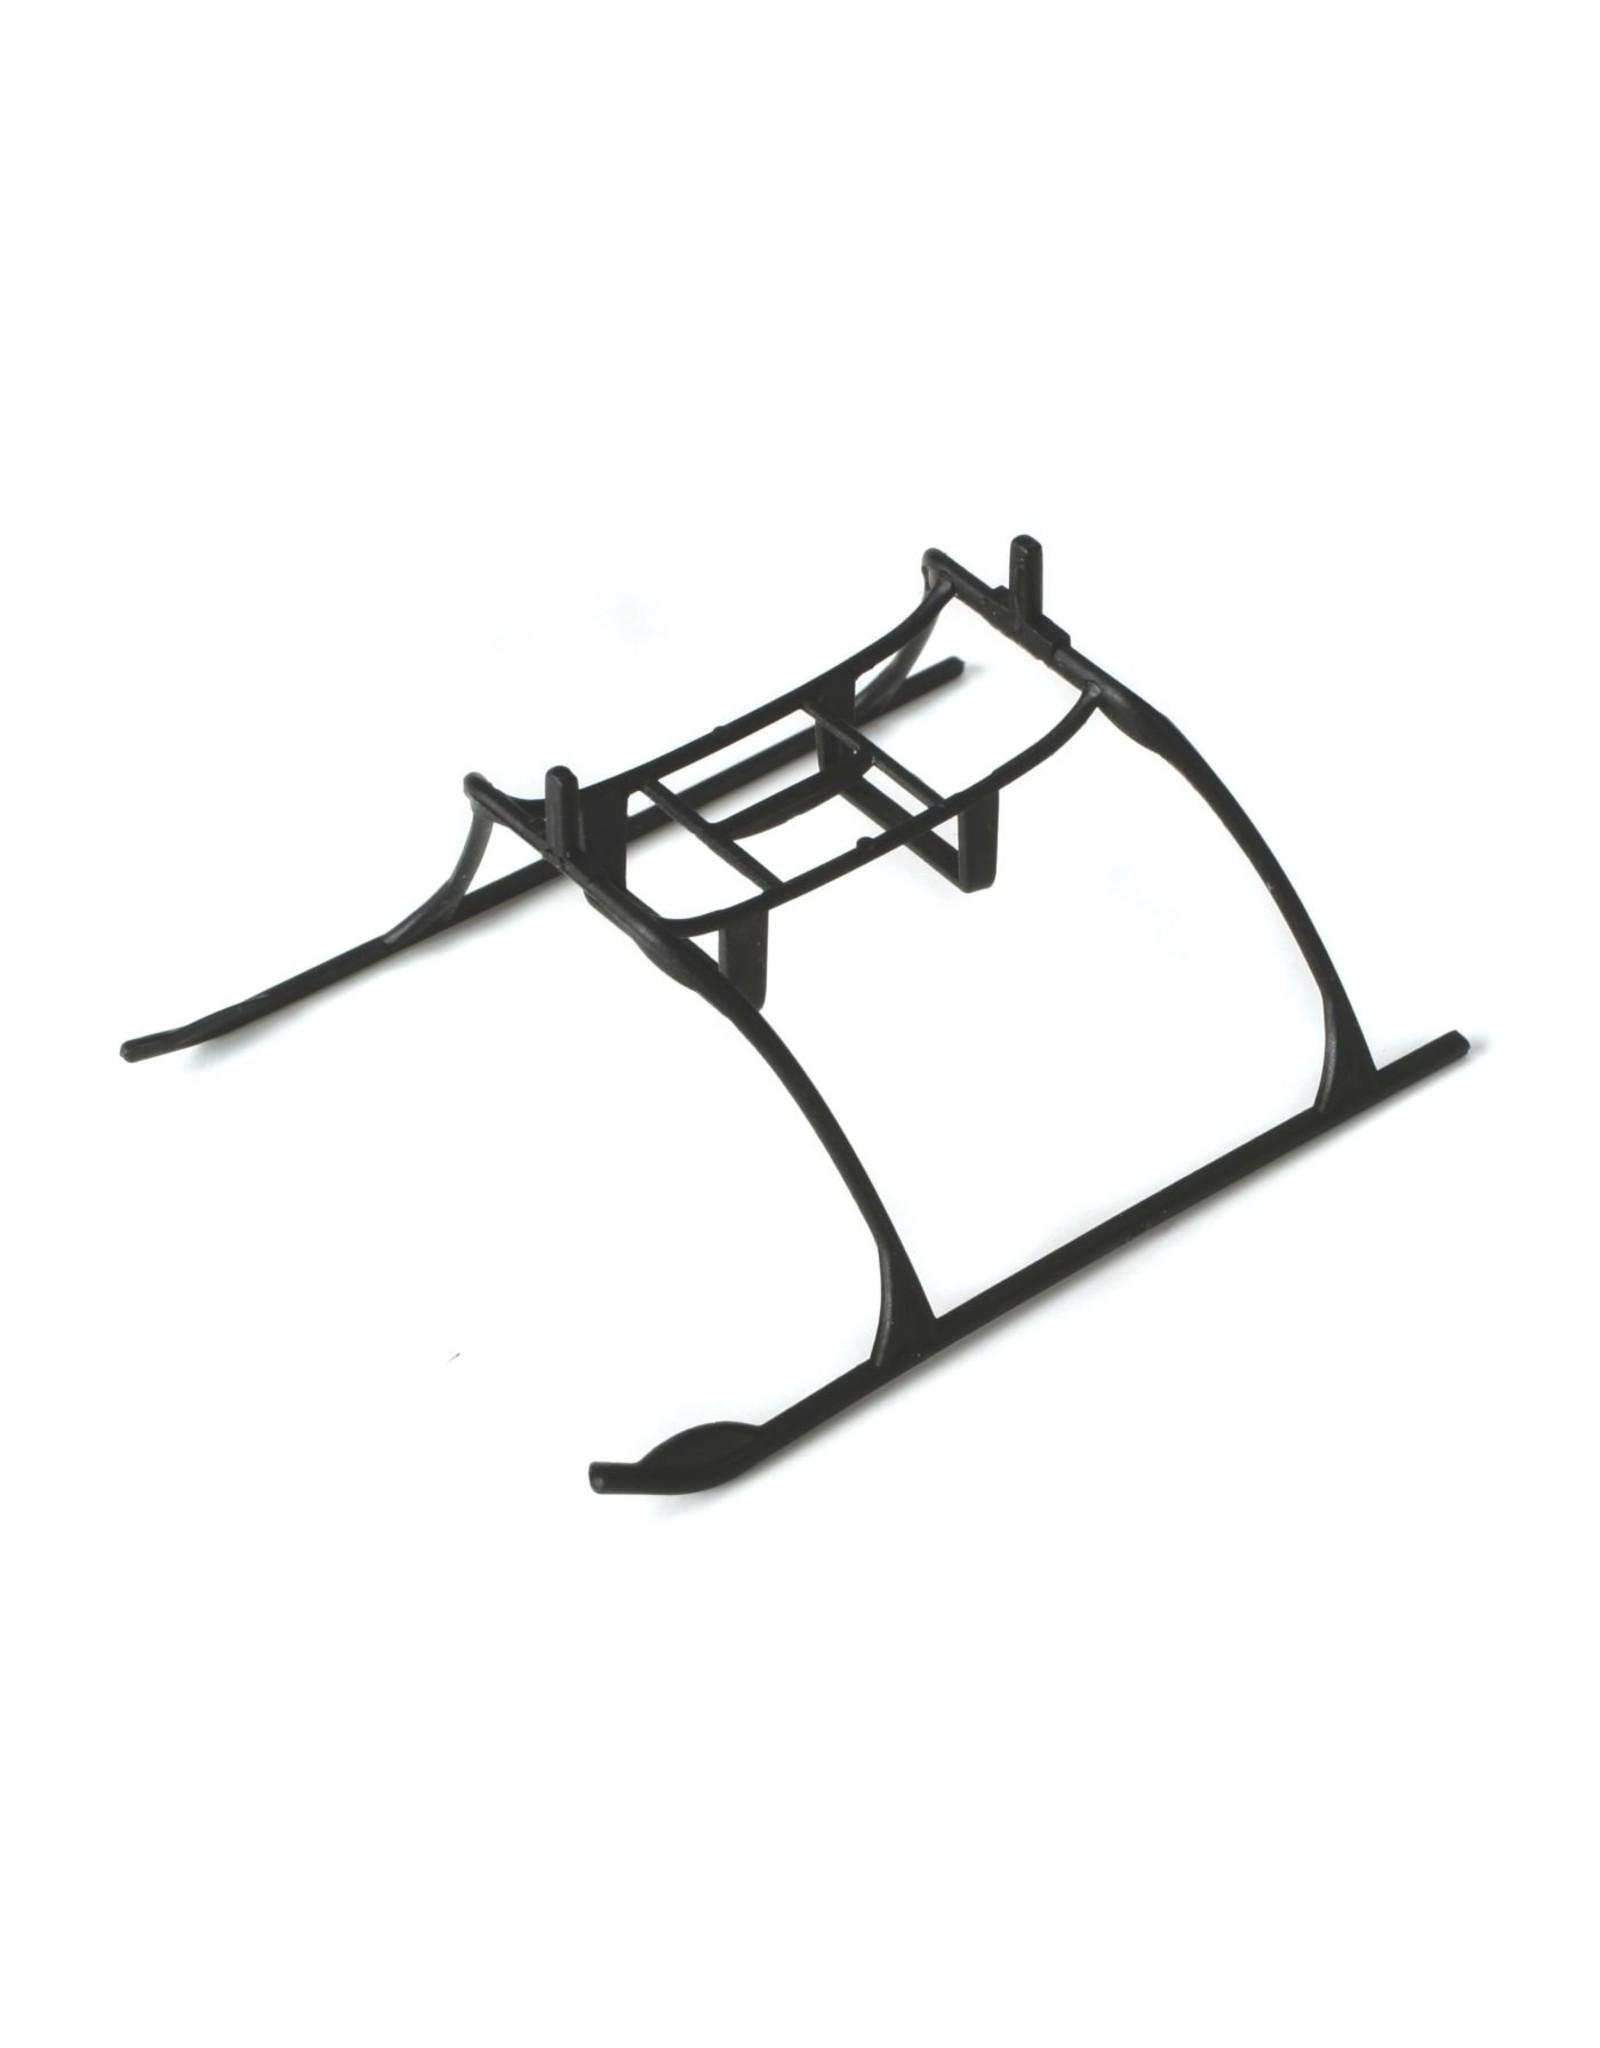 E-flite H2222 - Landing Skid and Battery Mount Set: BMCX/2